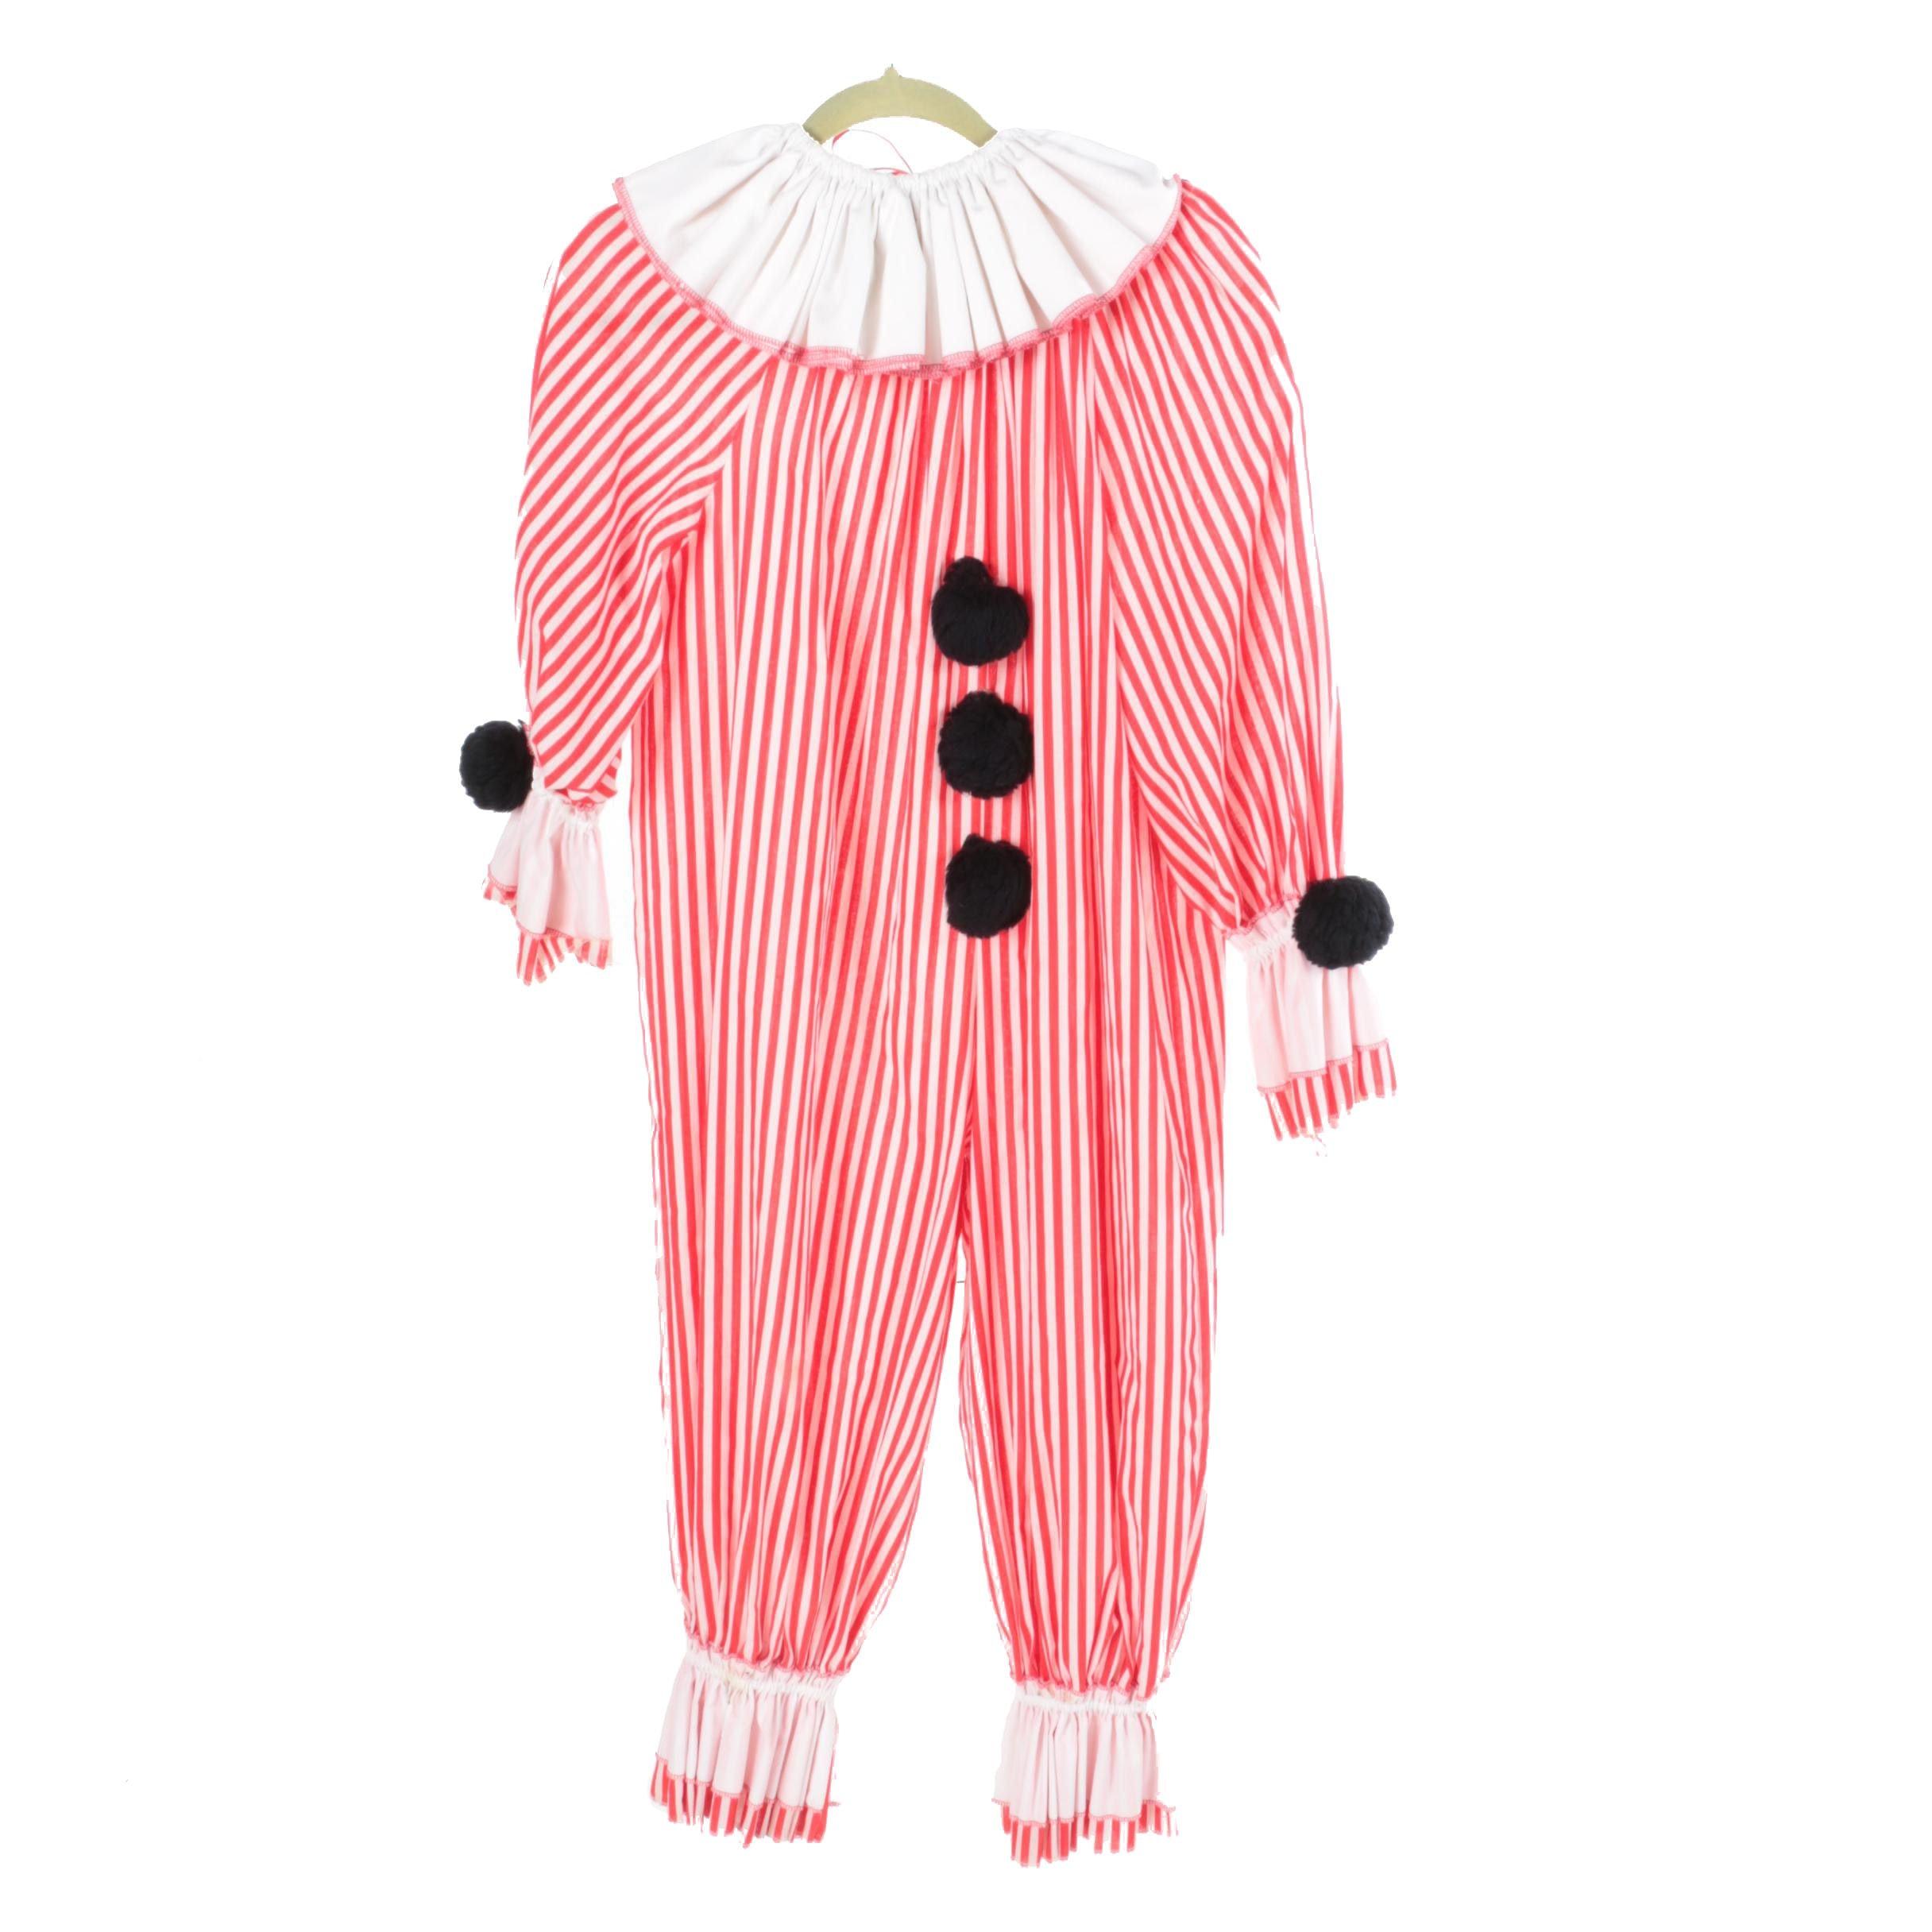 Vintage Clown Costume